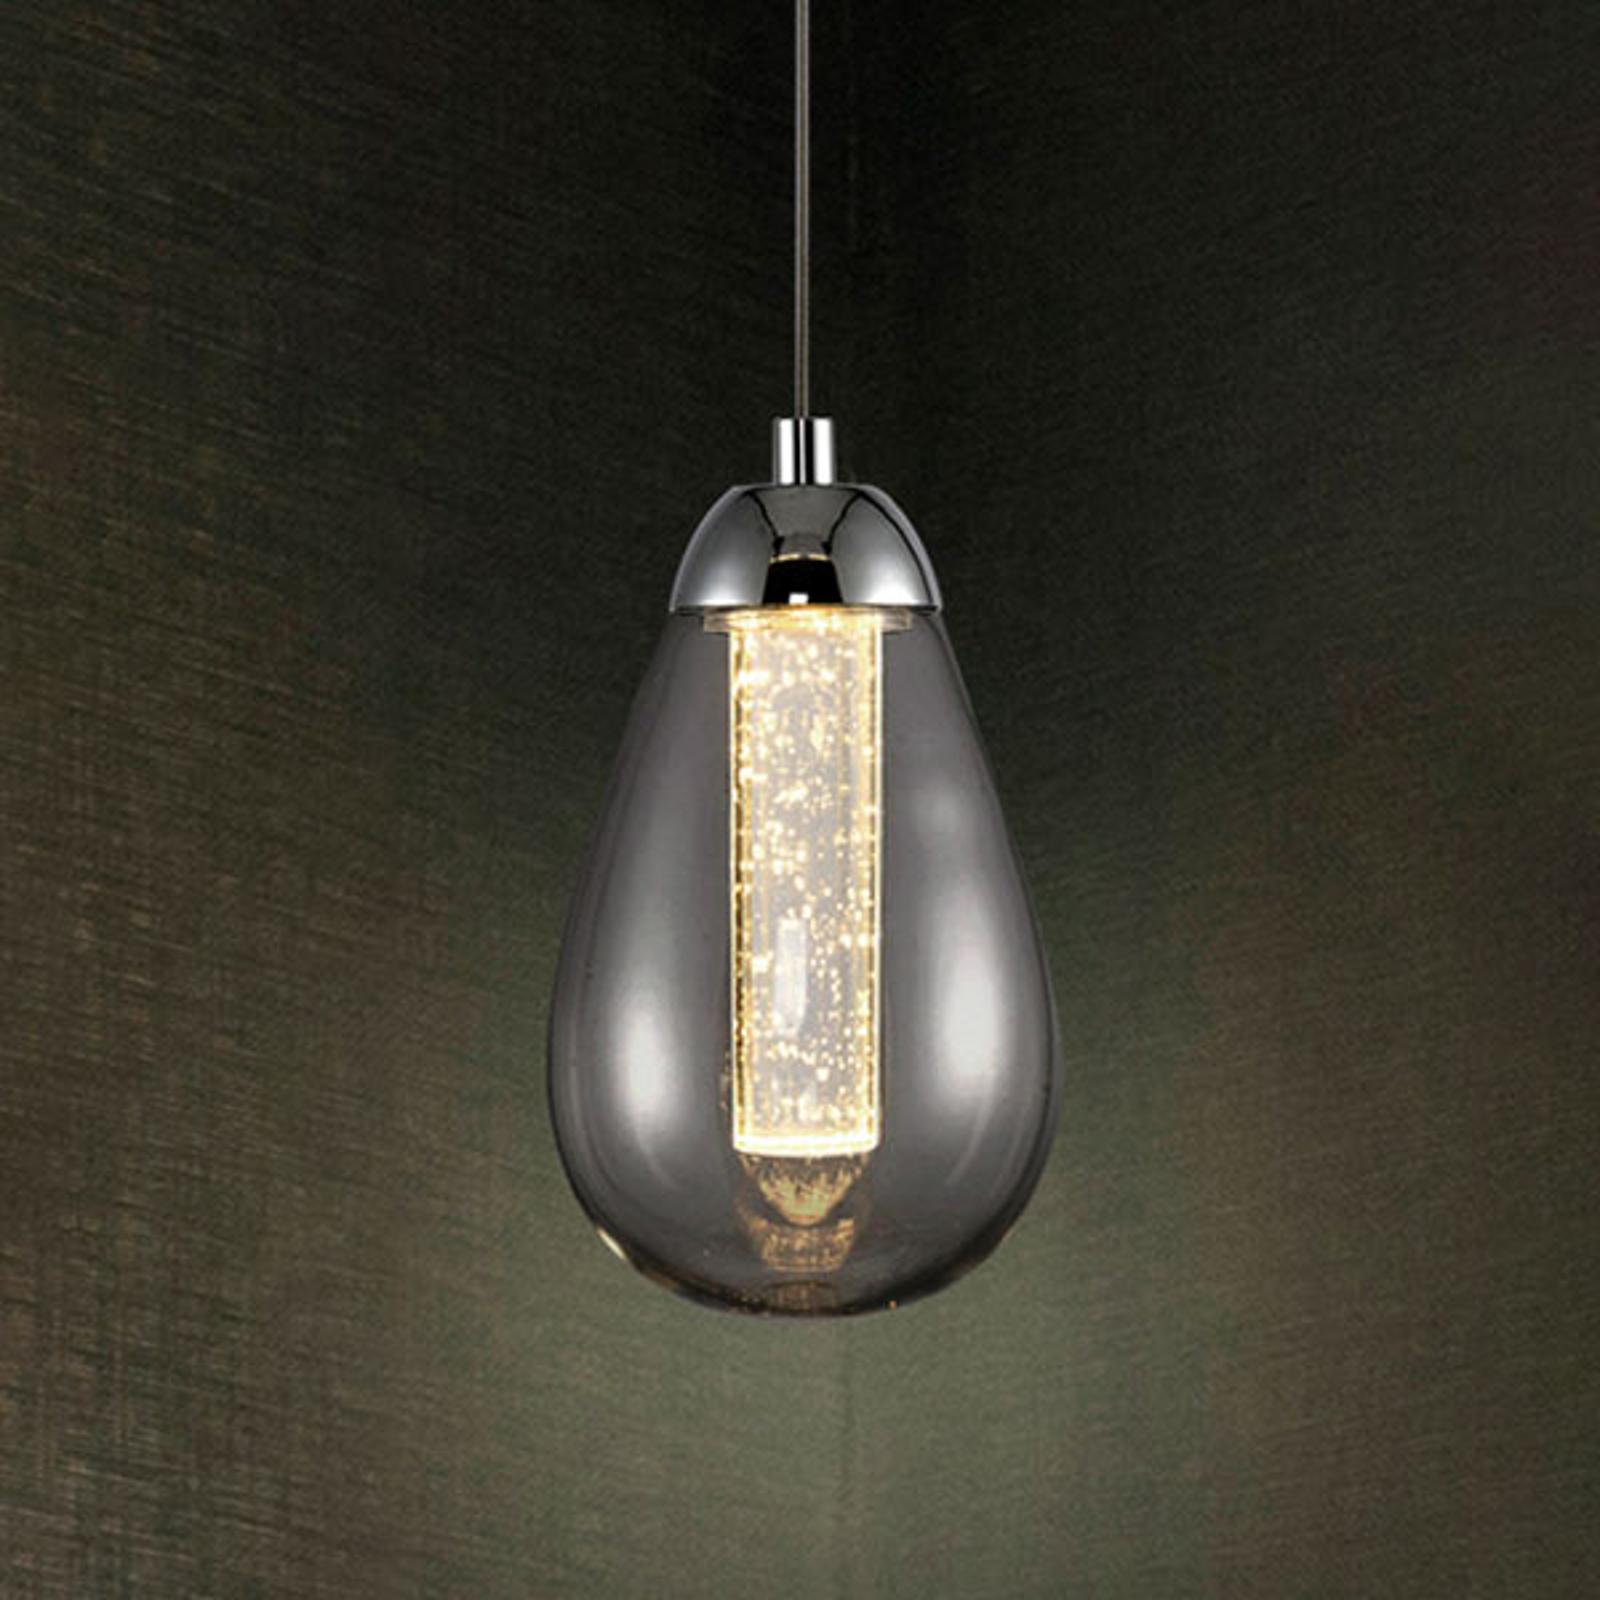 Lampa wisząca LED Taccia, 1-punktowa